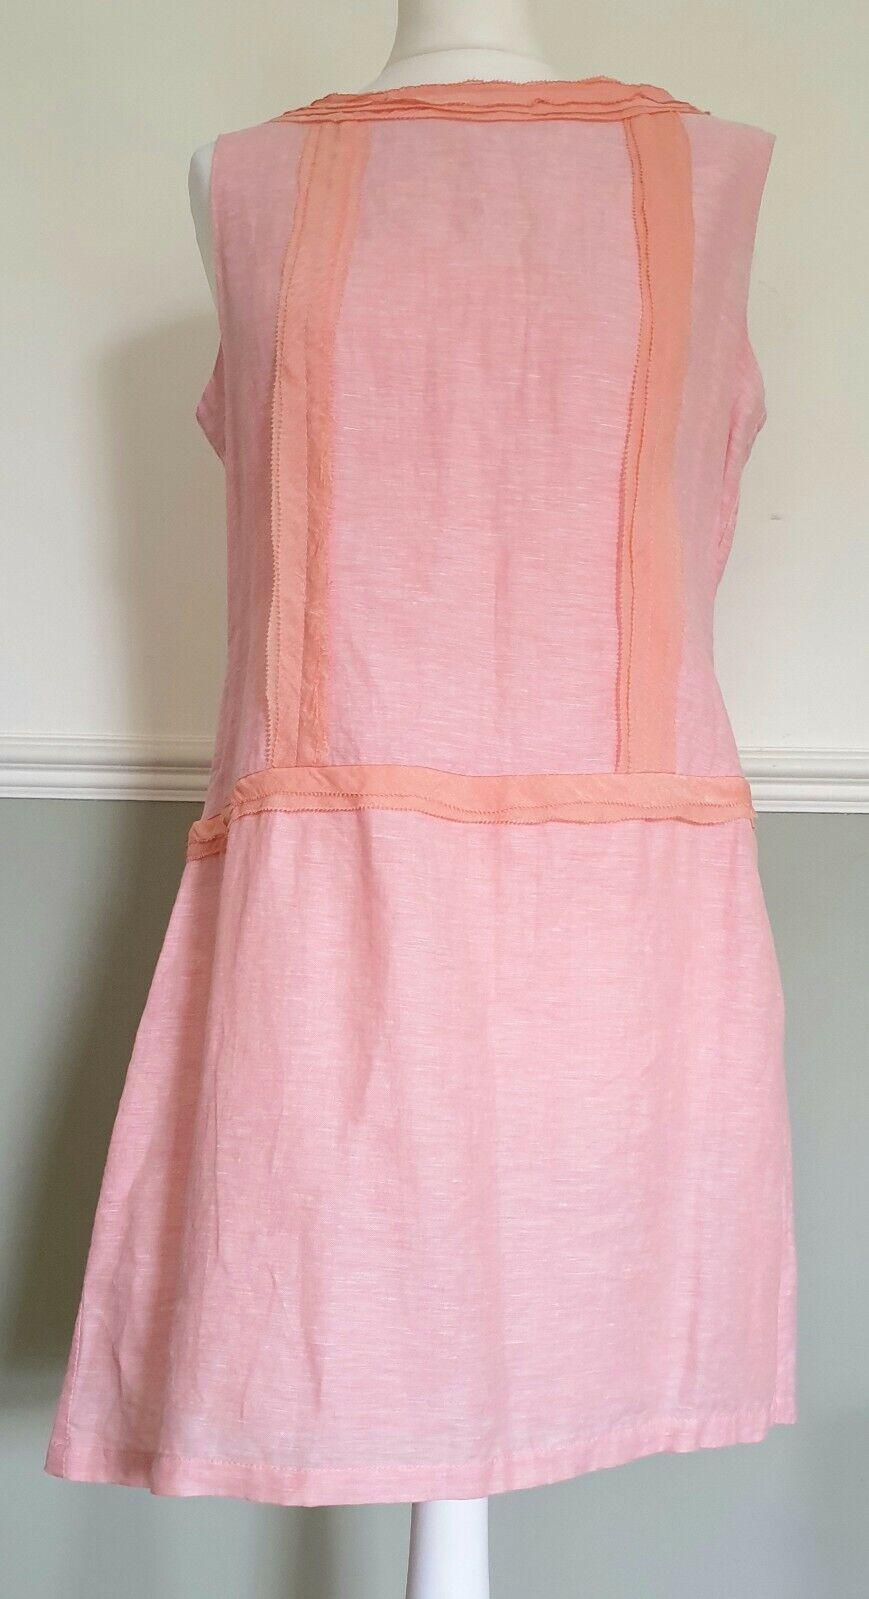 Coral Pink 100% Linen Shift Dress Sleeveless Anany UK 14 Summer Holiday Wedding